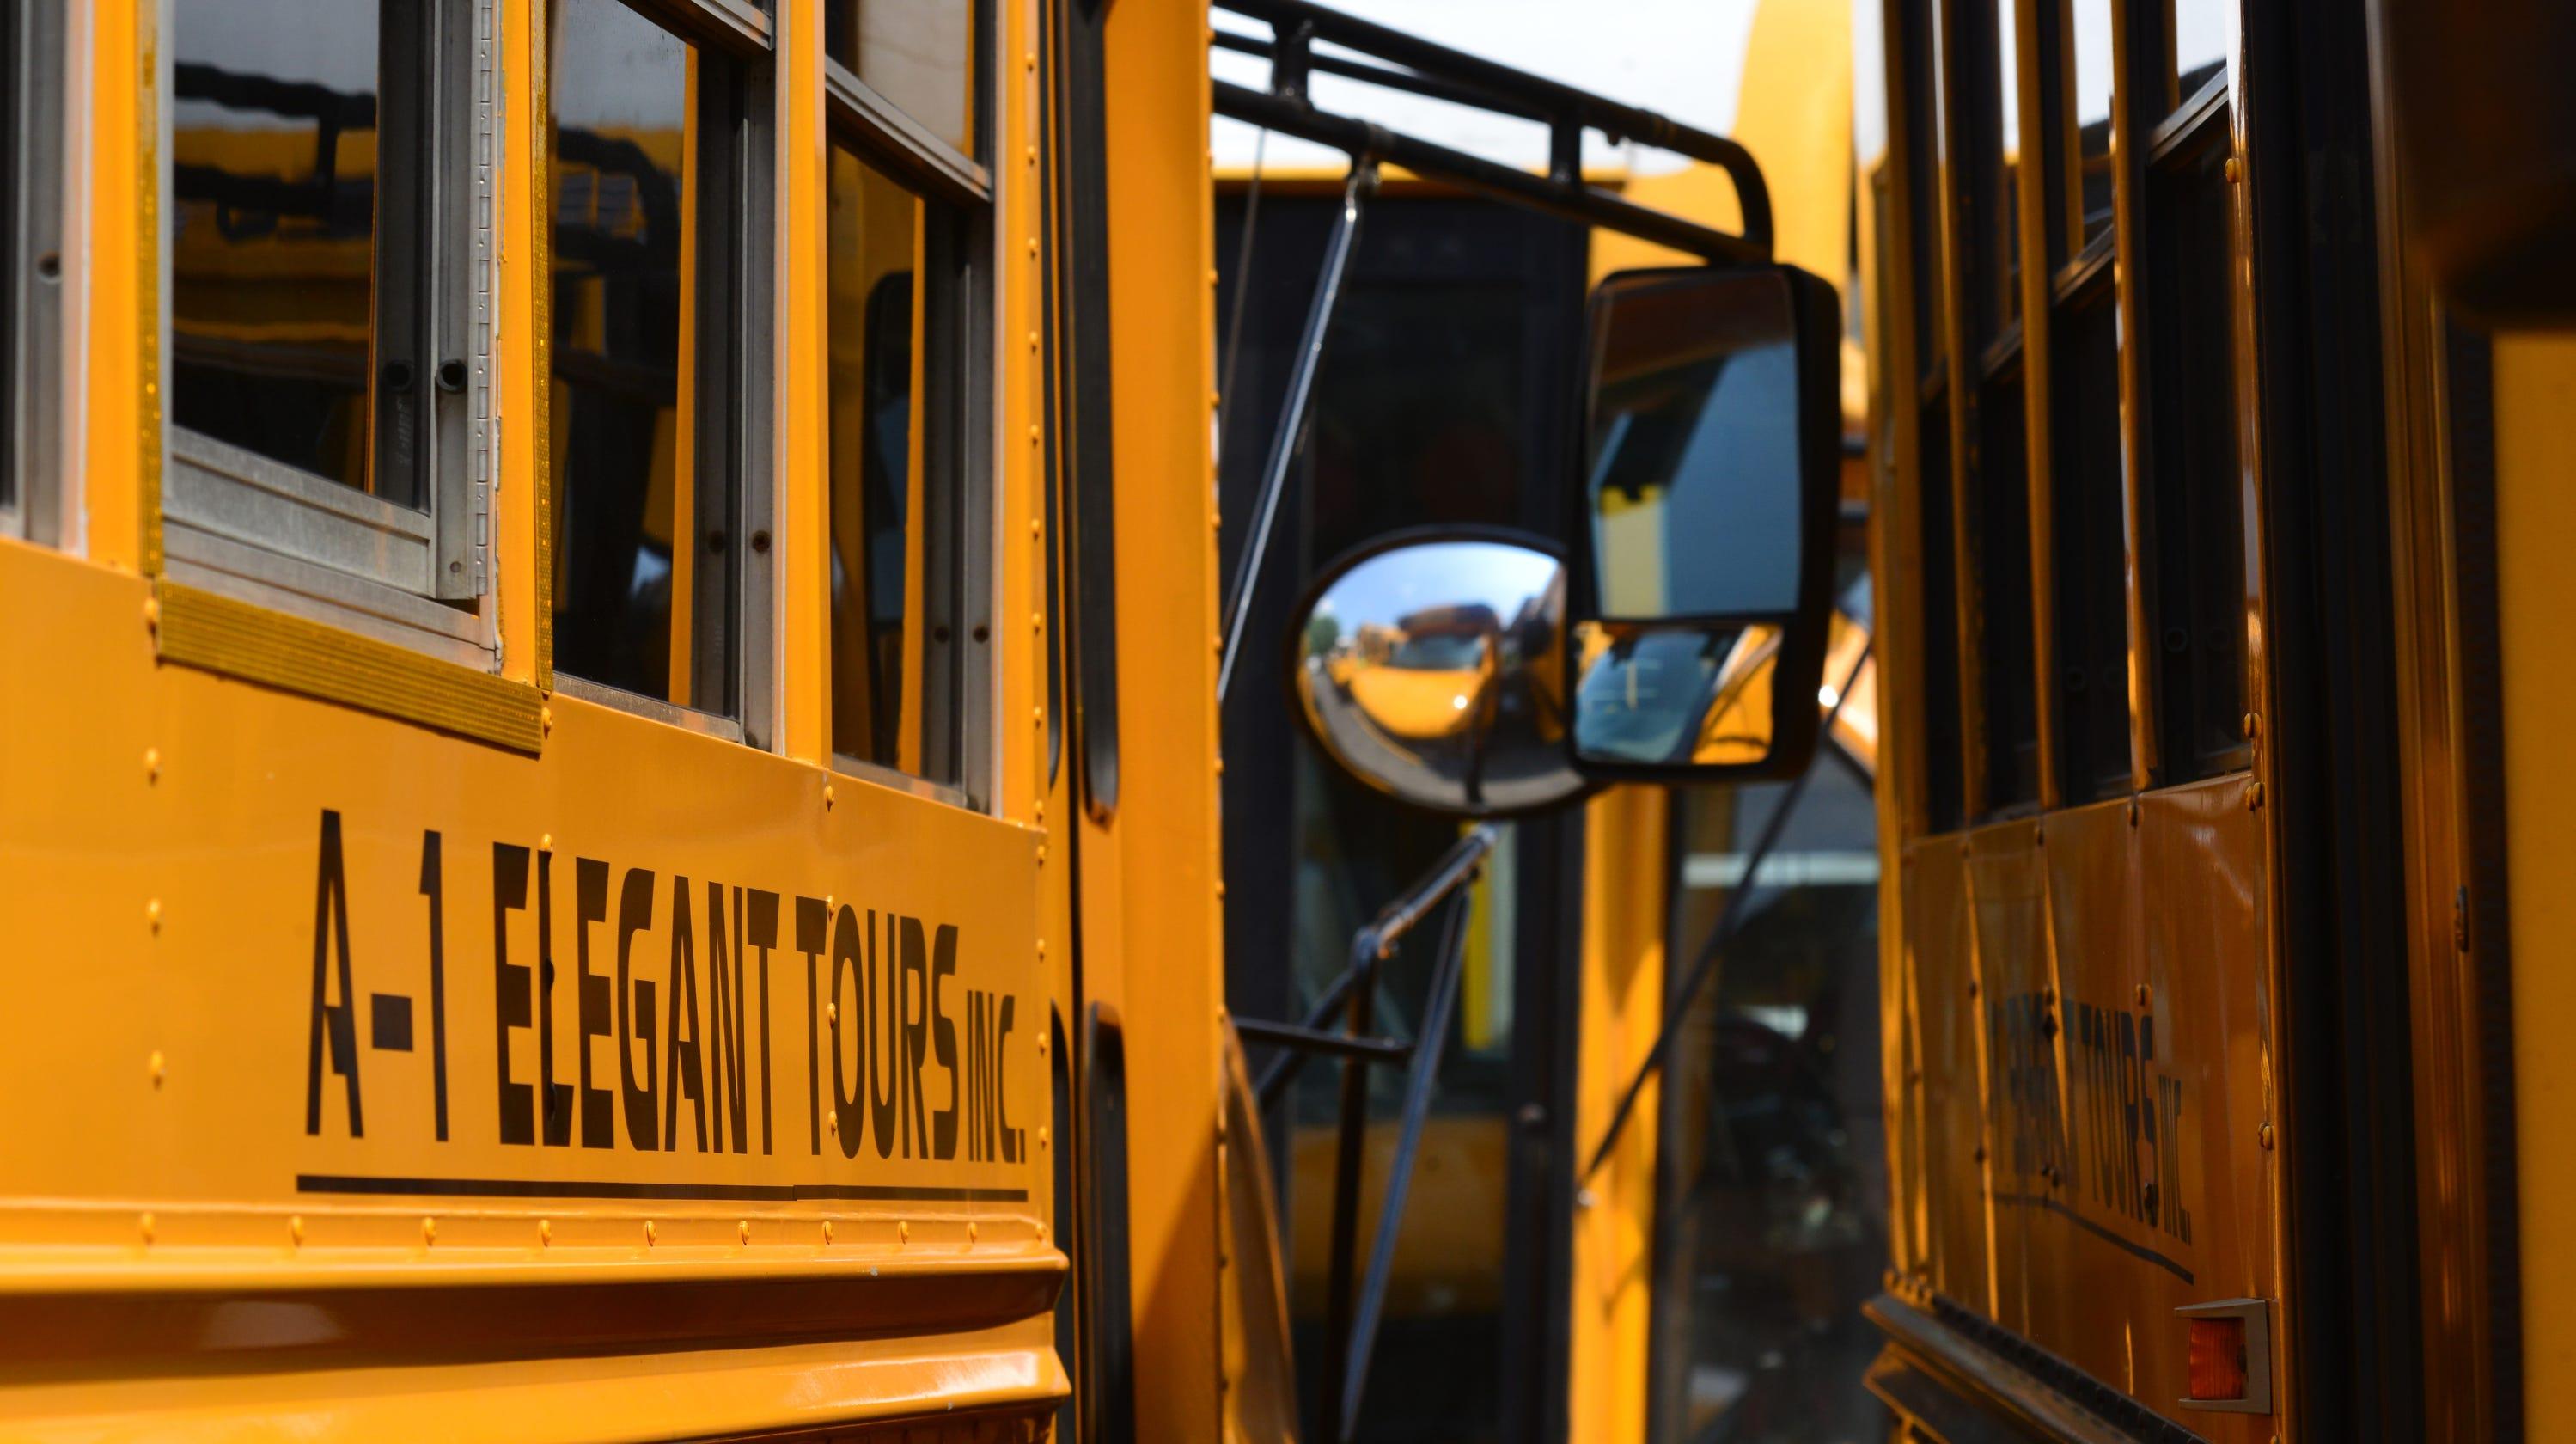 Paterson NJ school bus company keeps Passaic NJ contracts